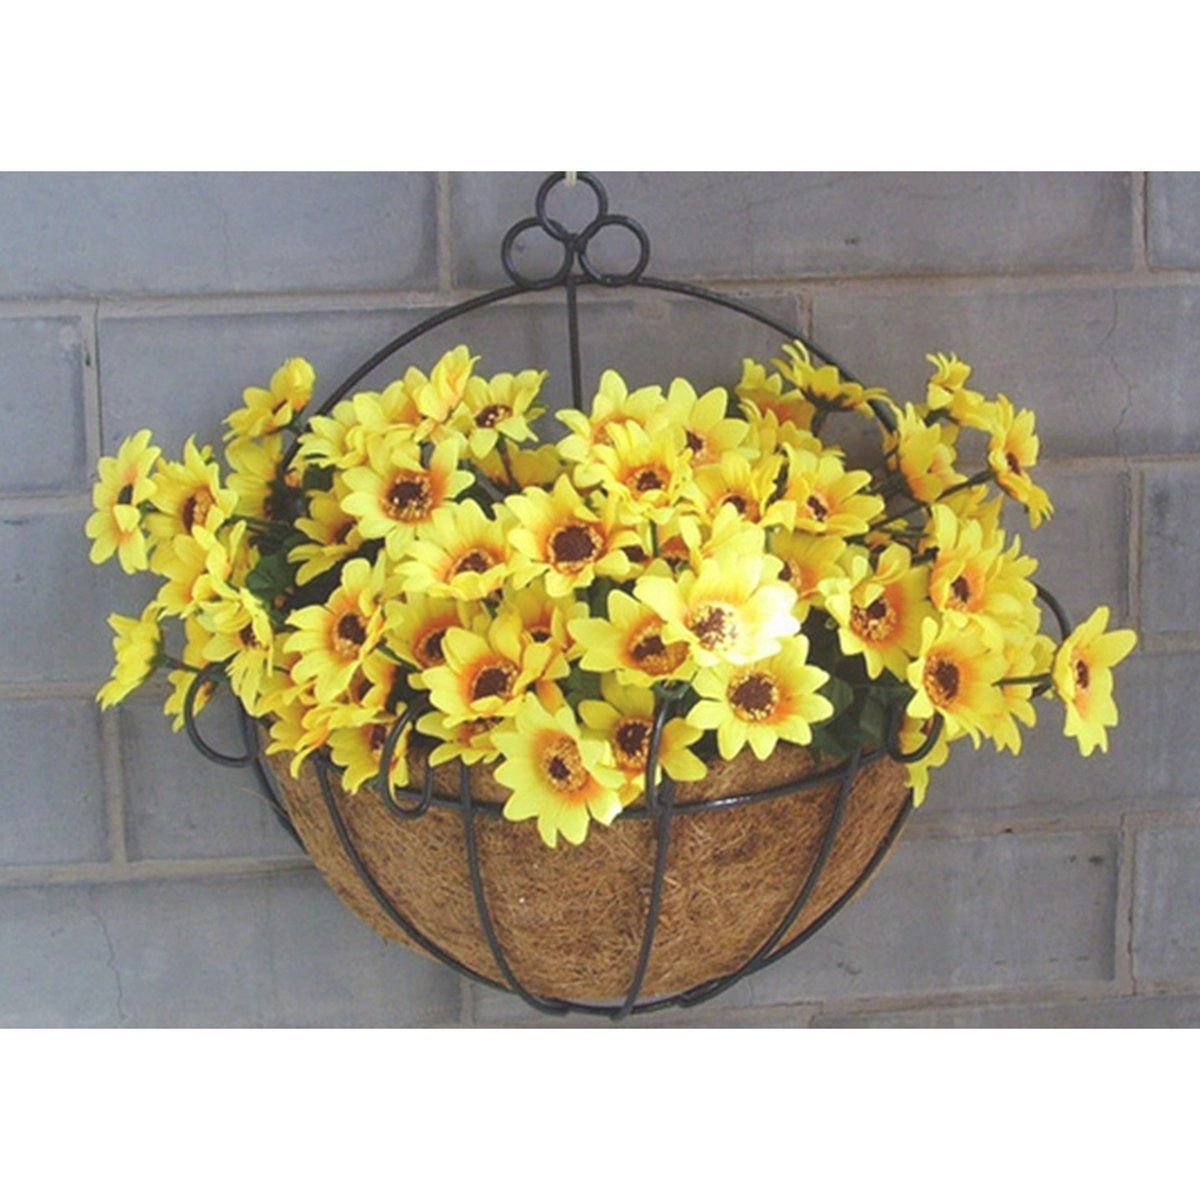 Kingso wall hanging basket planter flower plant pot home